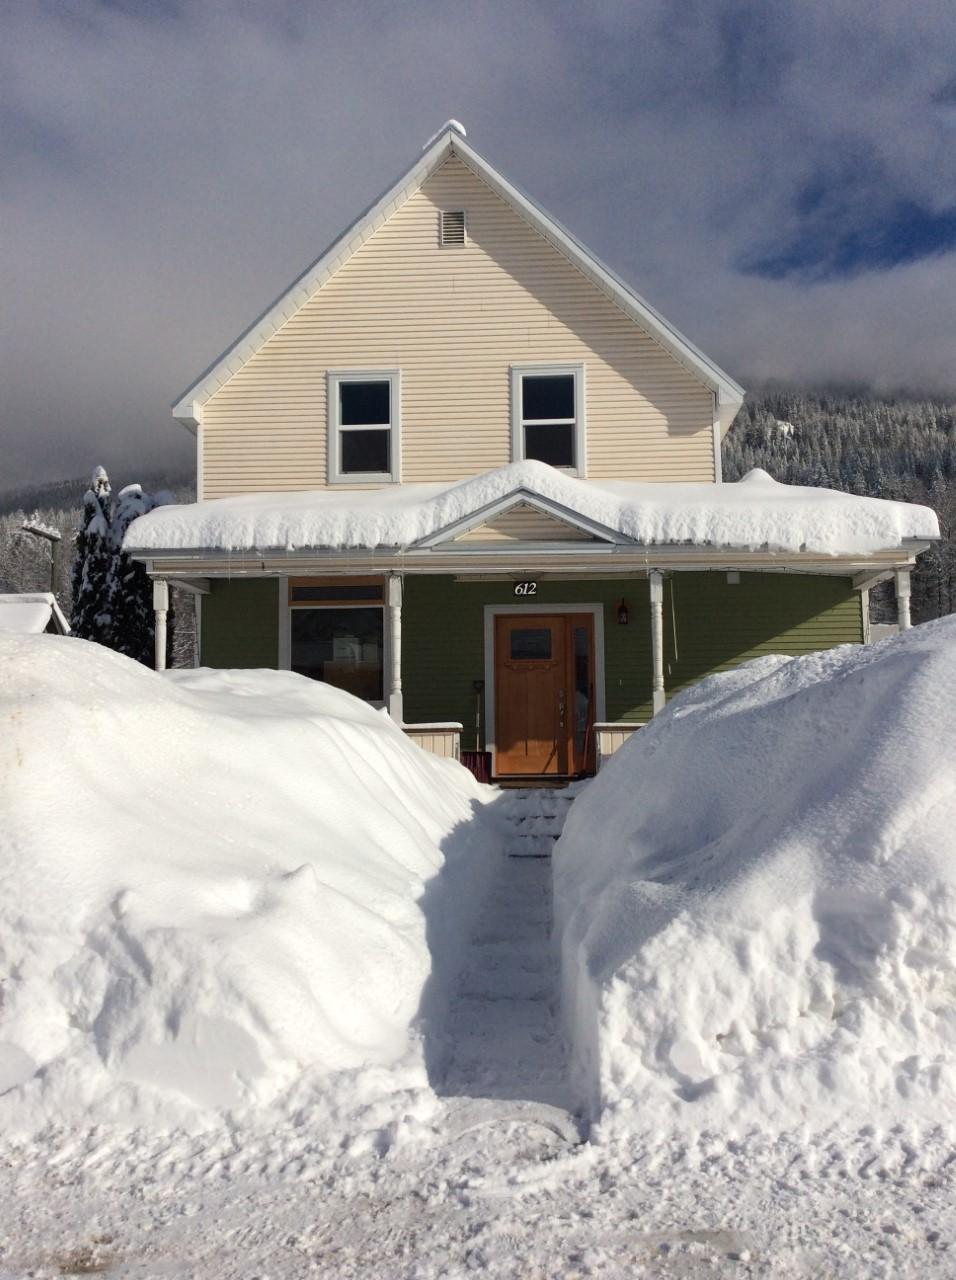 house winter.jpg